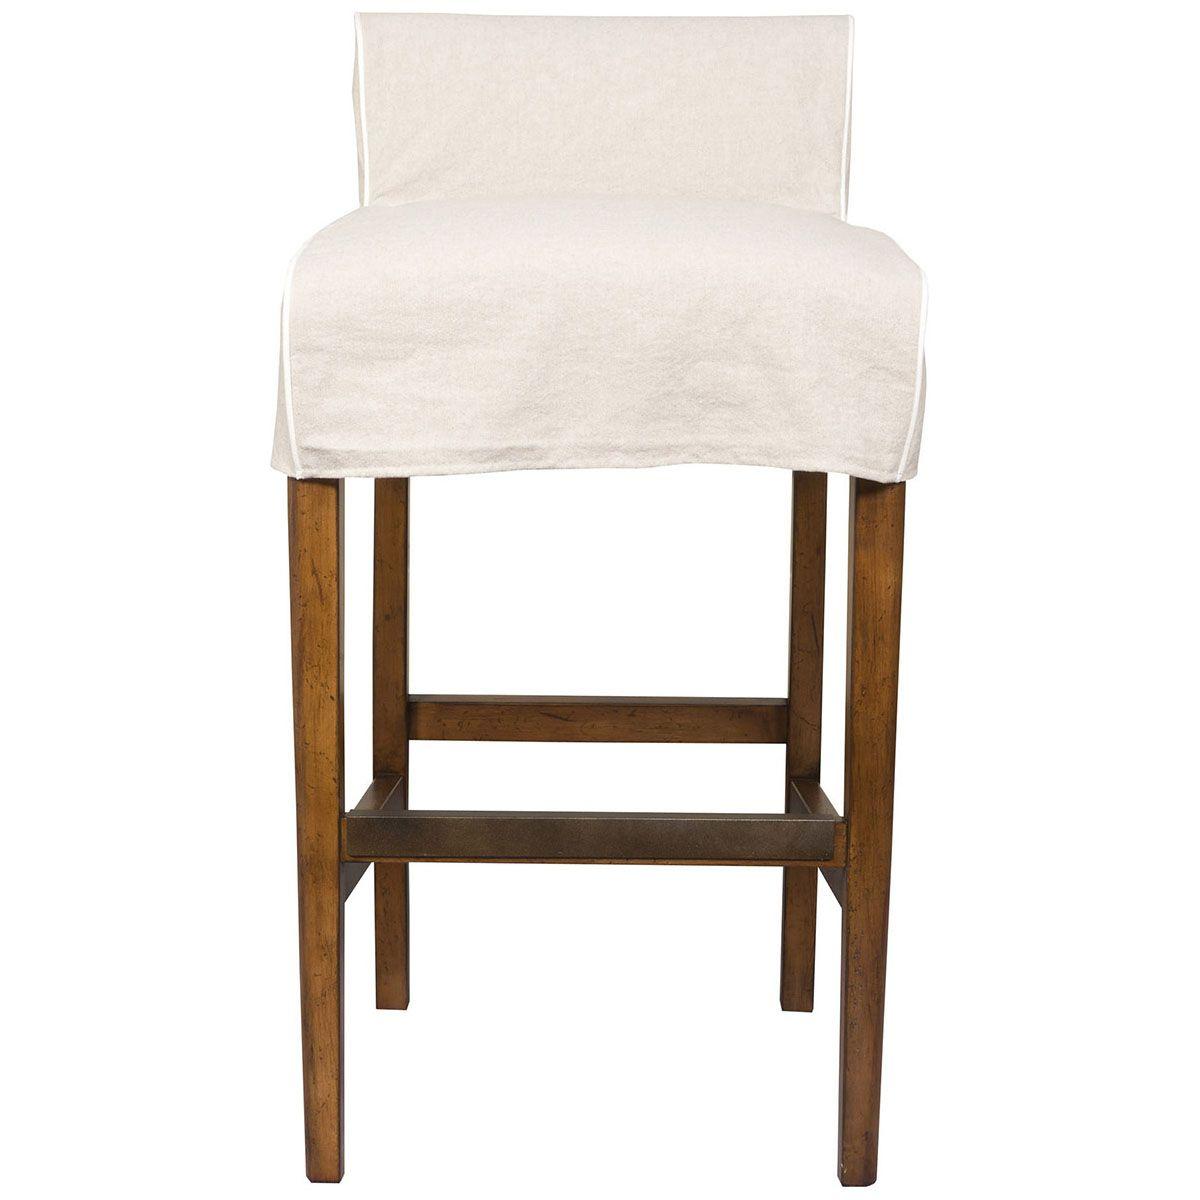 Vanguard Furniture Salty Dog Bar Stool Slipcover Grommet Lacing S5511 Bs